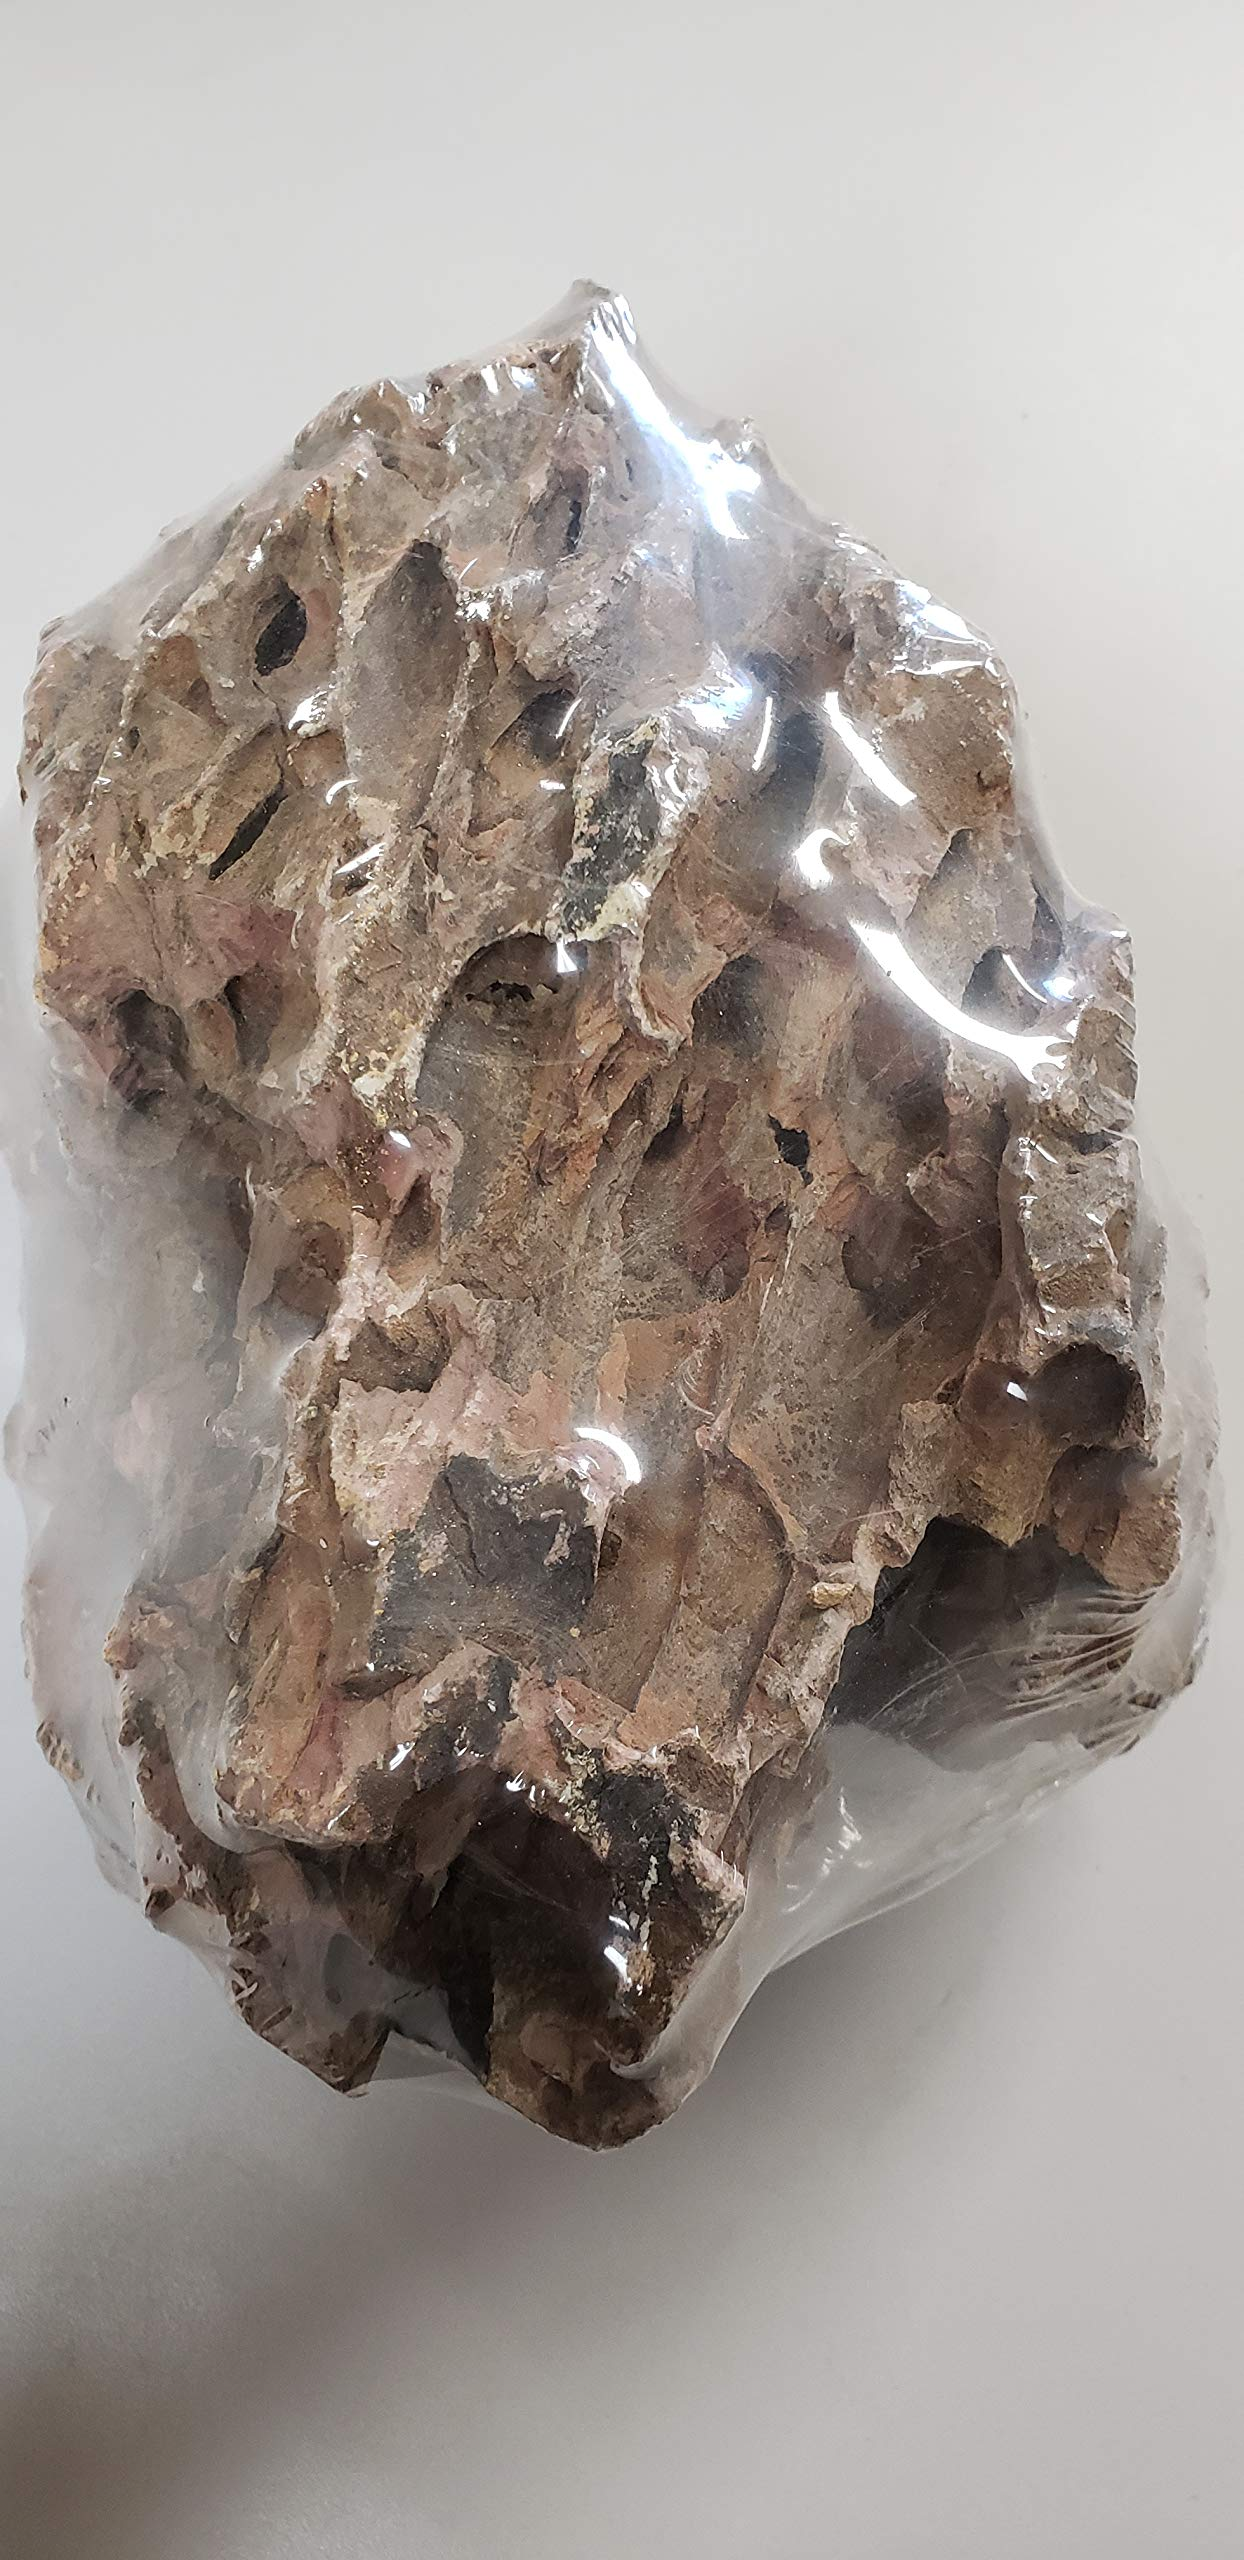 SevenSeaSupply Ohko Dragon Stone - 15 lbs. Mixed Size - PRE Washed - Individually Wrapped - - Aquarium Stone by SevenSeaSupply